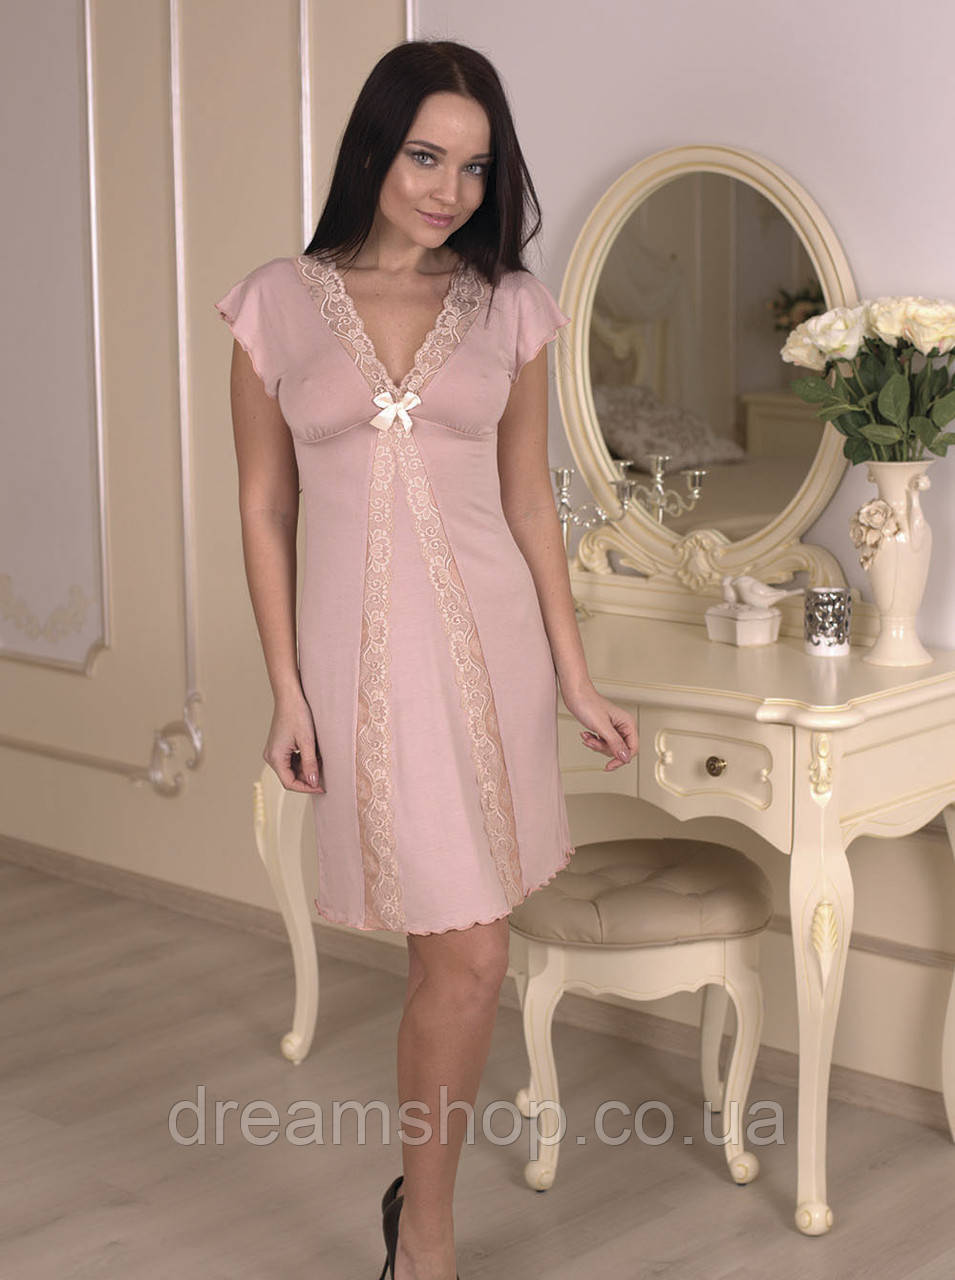 abff88124a00cf0 Ночная рубашка Вискоза, цена 400 грн., купить Гусятин — Prom.ua  (ID#615476546)